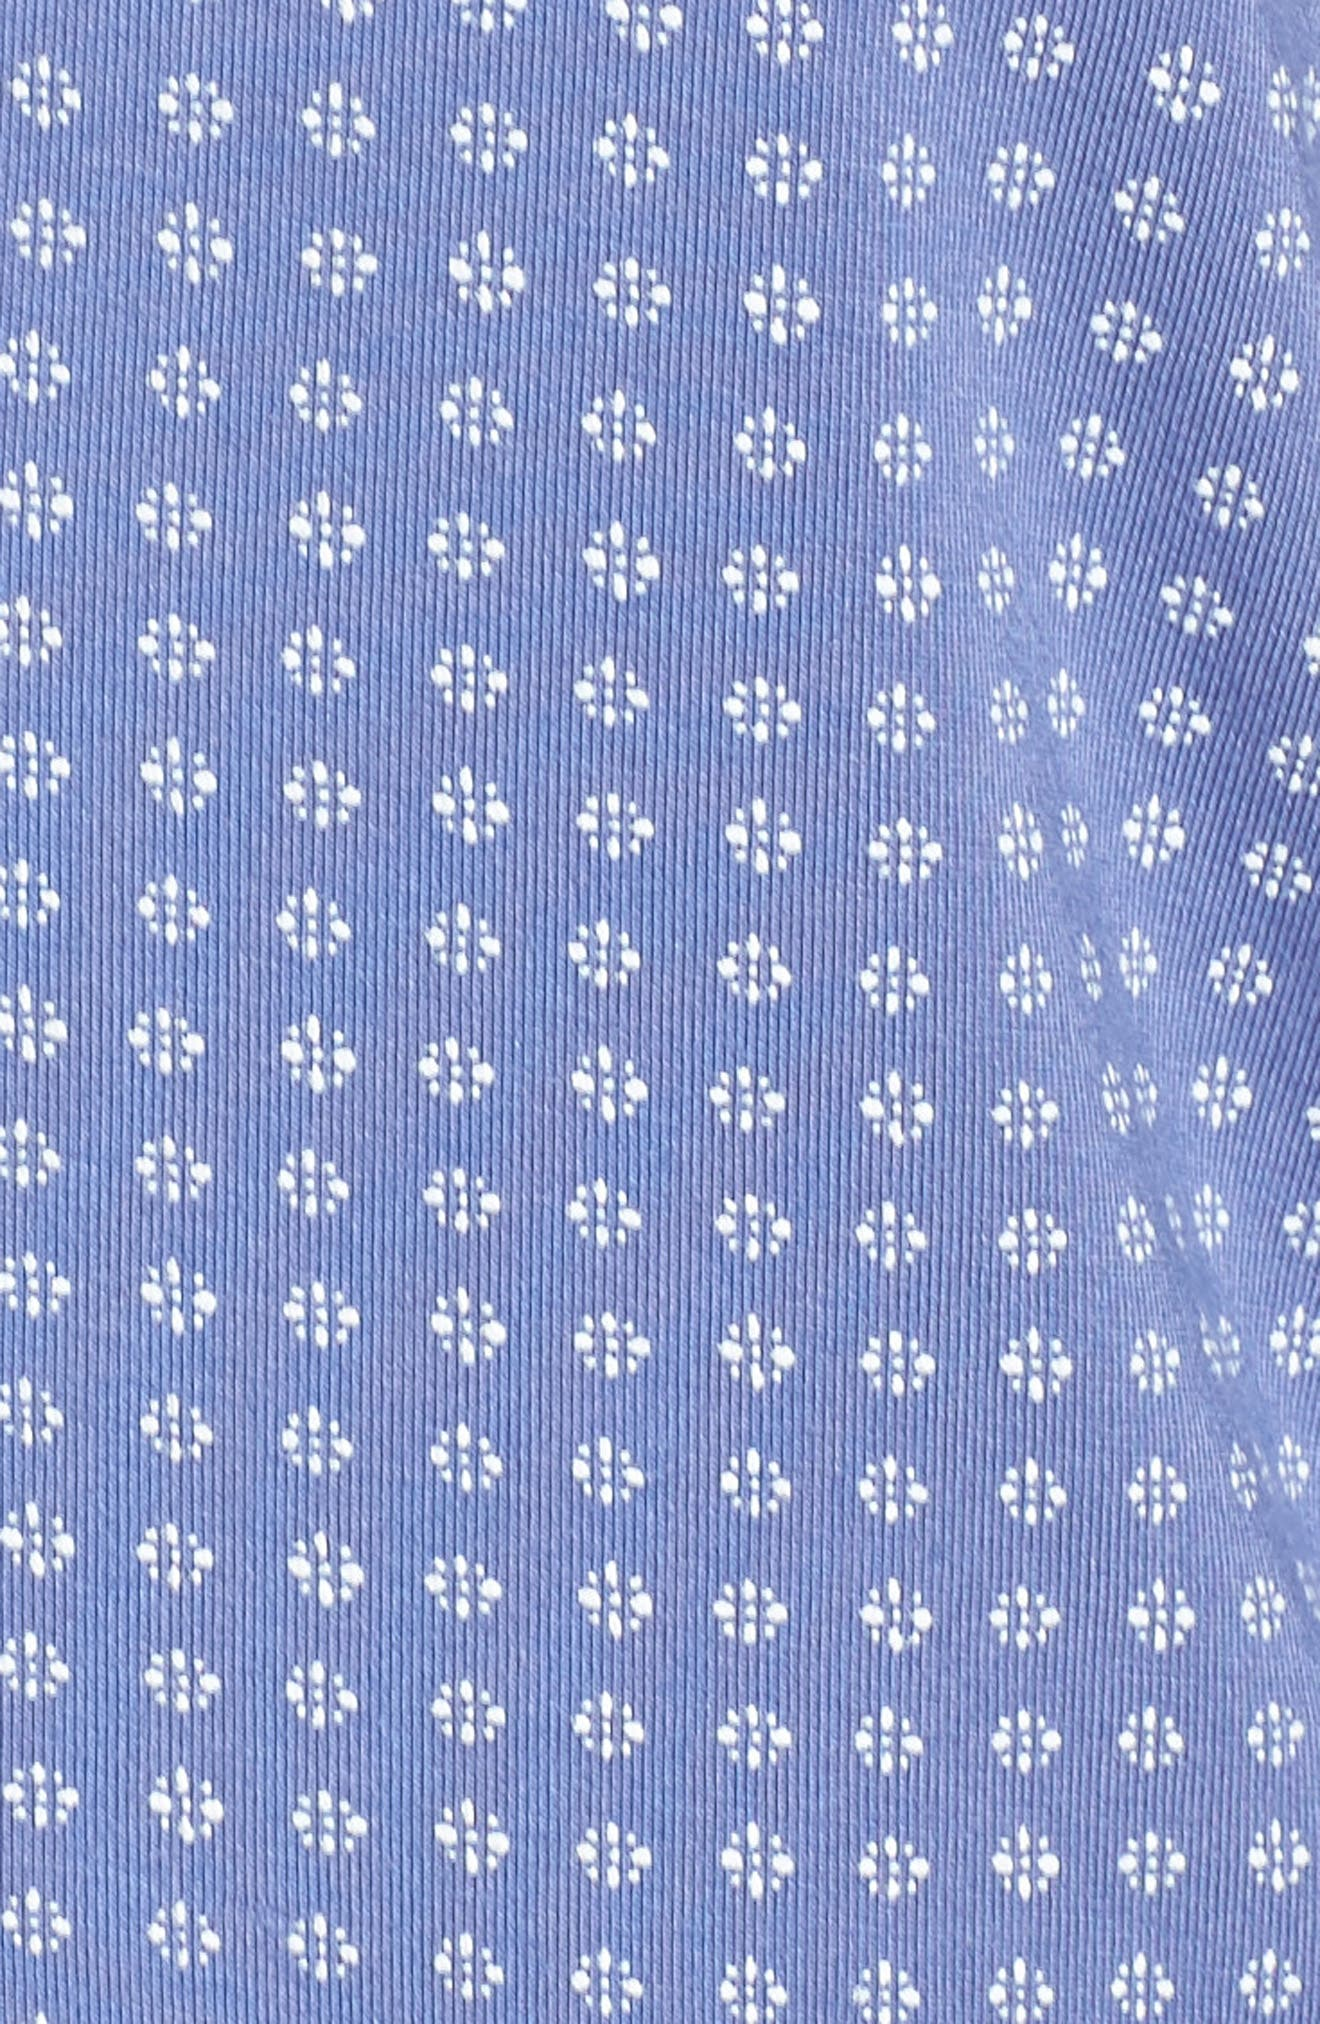 Moonlight Pajamas,                             Alternate thumbnail 5, color,                             Blue Denim Geo